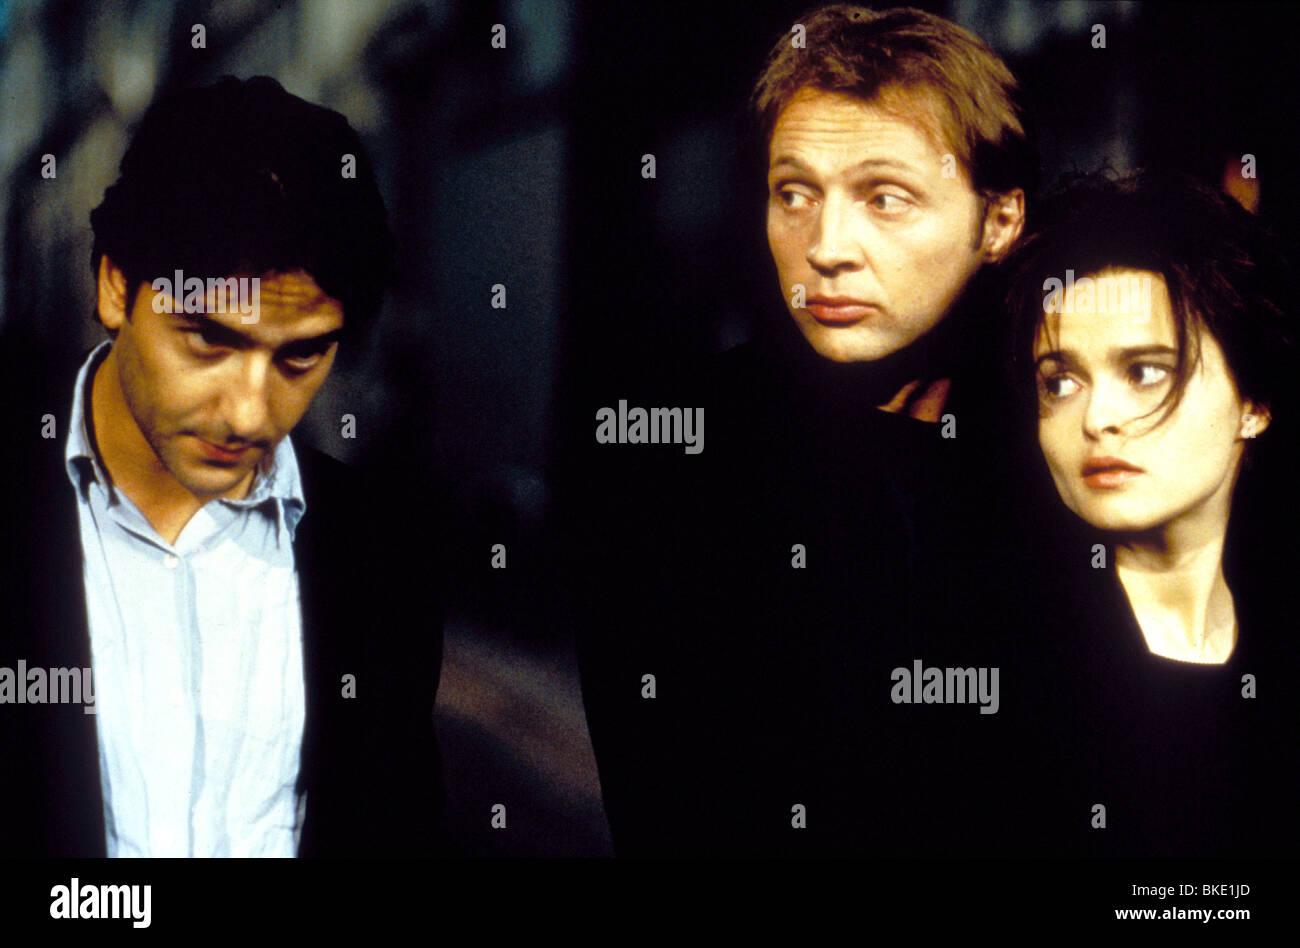 7865f2423d6 PORTRAITS CHINOIS (1996) SHADOW PLAY (ALT) YVAN ATTAL, JEAN-PHILIPPE  ECOFFEY, HELENA BONHAM CARTER PORT 071